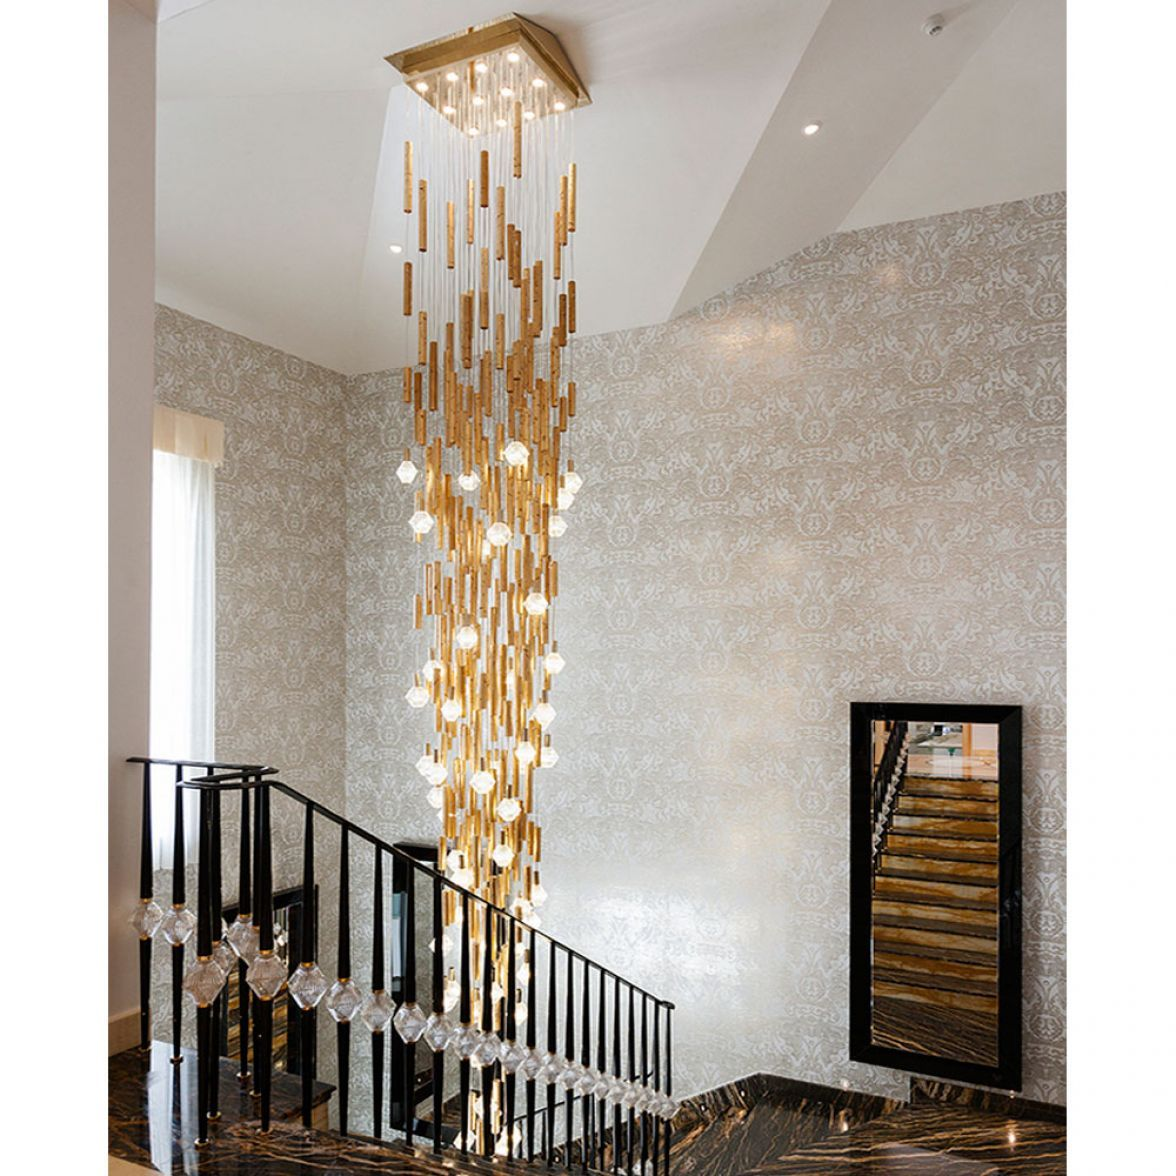 J'Adore chandelier